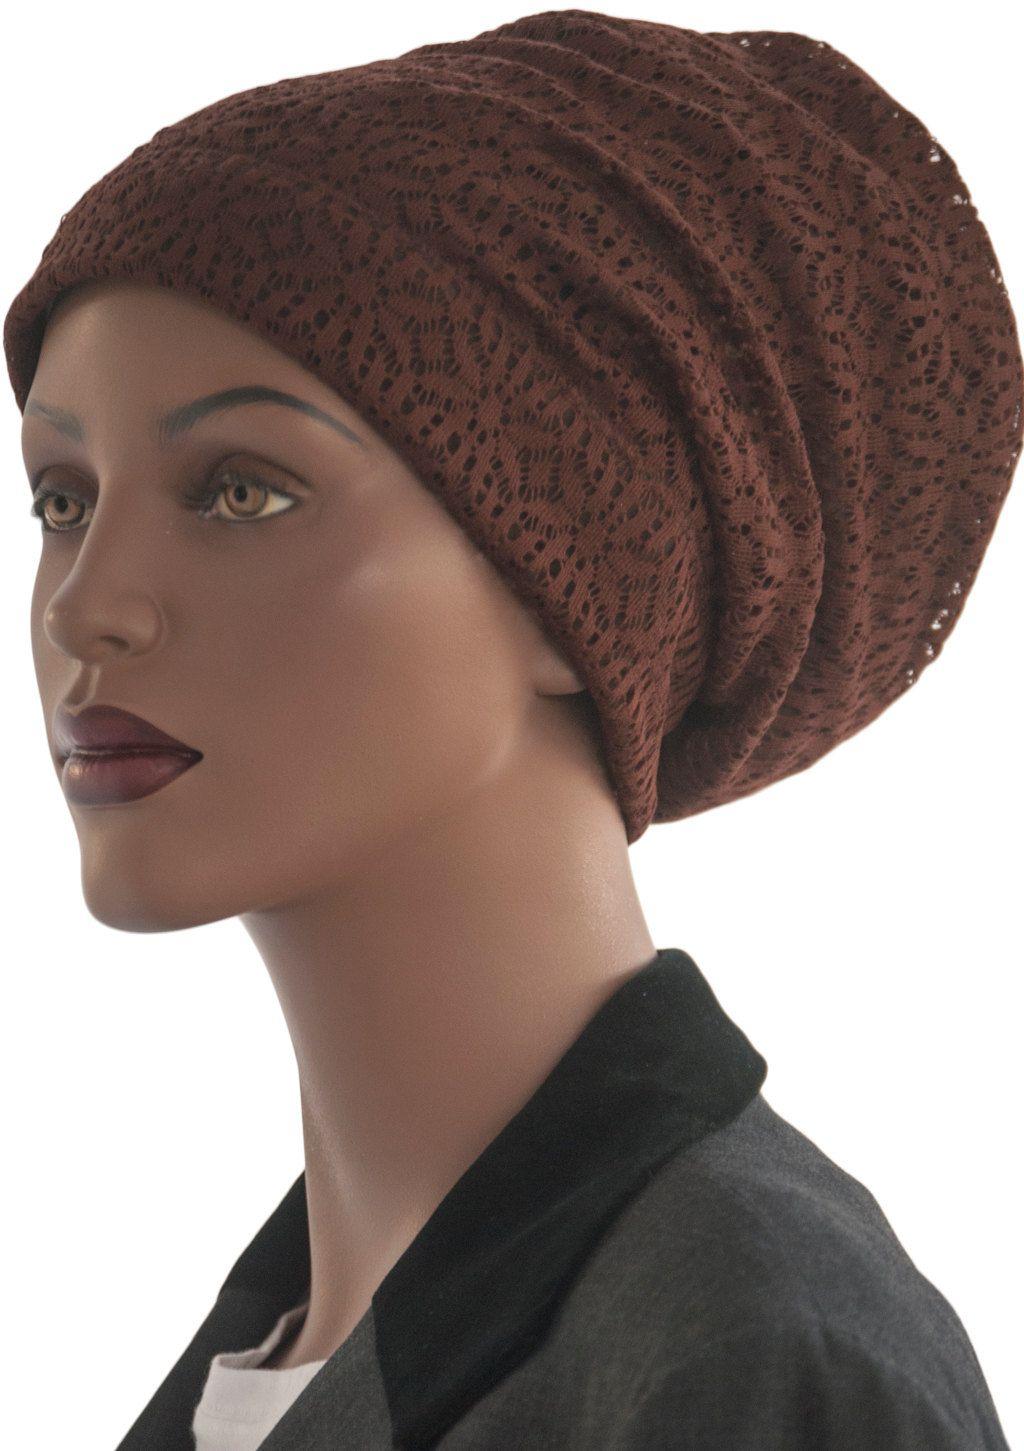 Loc Soc Dread Lock Sock Brown Stretch Lace Hair Dreadlock Drea Headband Hat Accessory Handmade By Coveredlasdesigns On